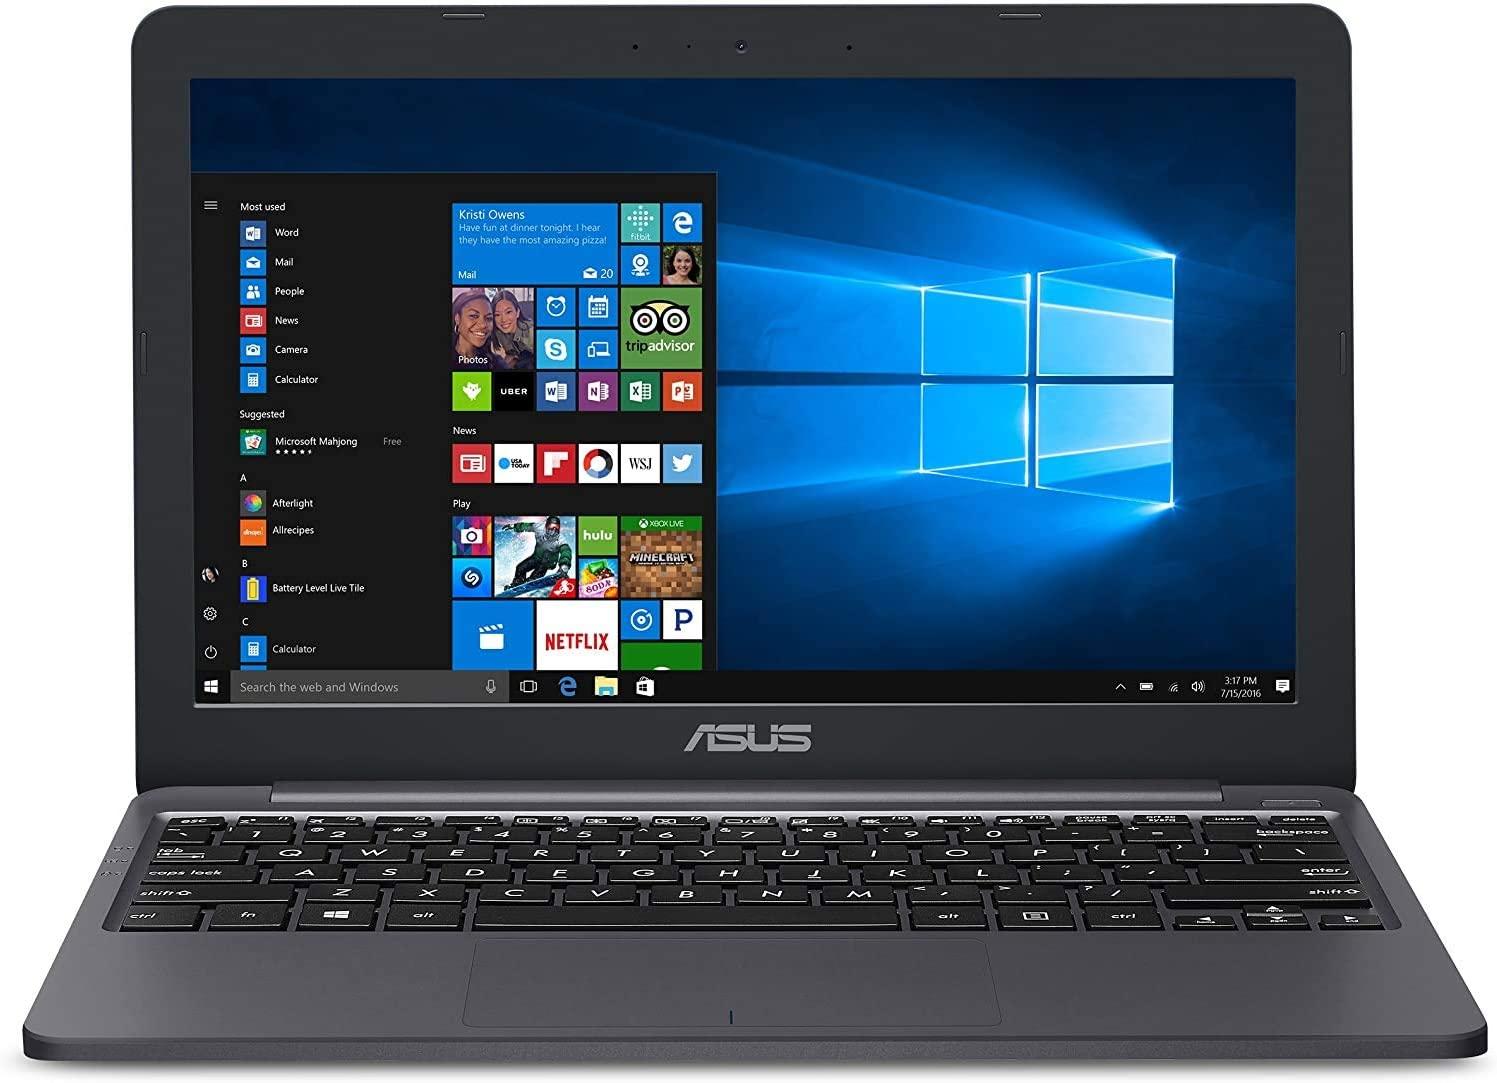 "2020 Newest ASUS Laptop L203MA Thin and Light Laptop, 11.6"" HD Display, Intel Celeron N4000 Processor, 4GB RAM, 64GB Storage, Webcam, Oydisen HDMI, Windows 10 S, Microsoft 365 (Google Classroom Ready)"